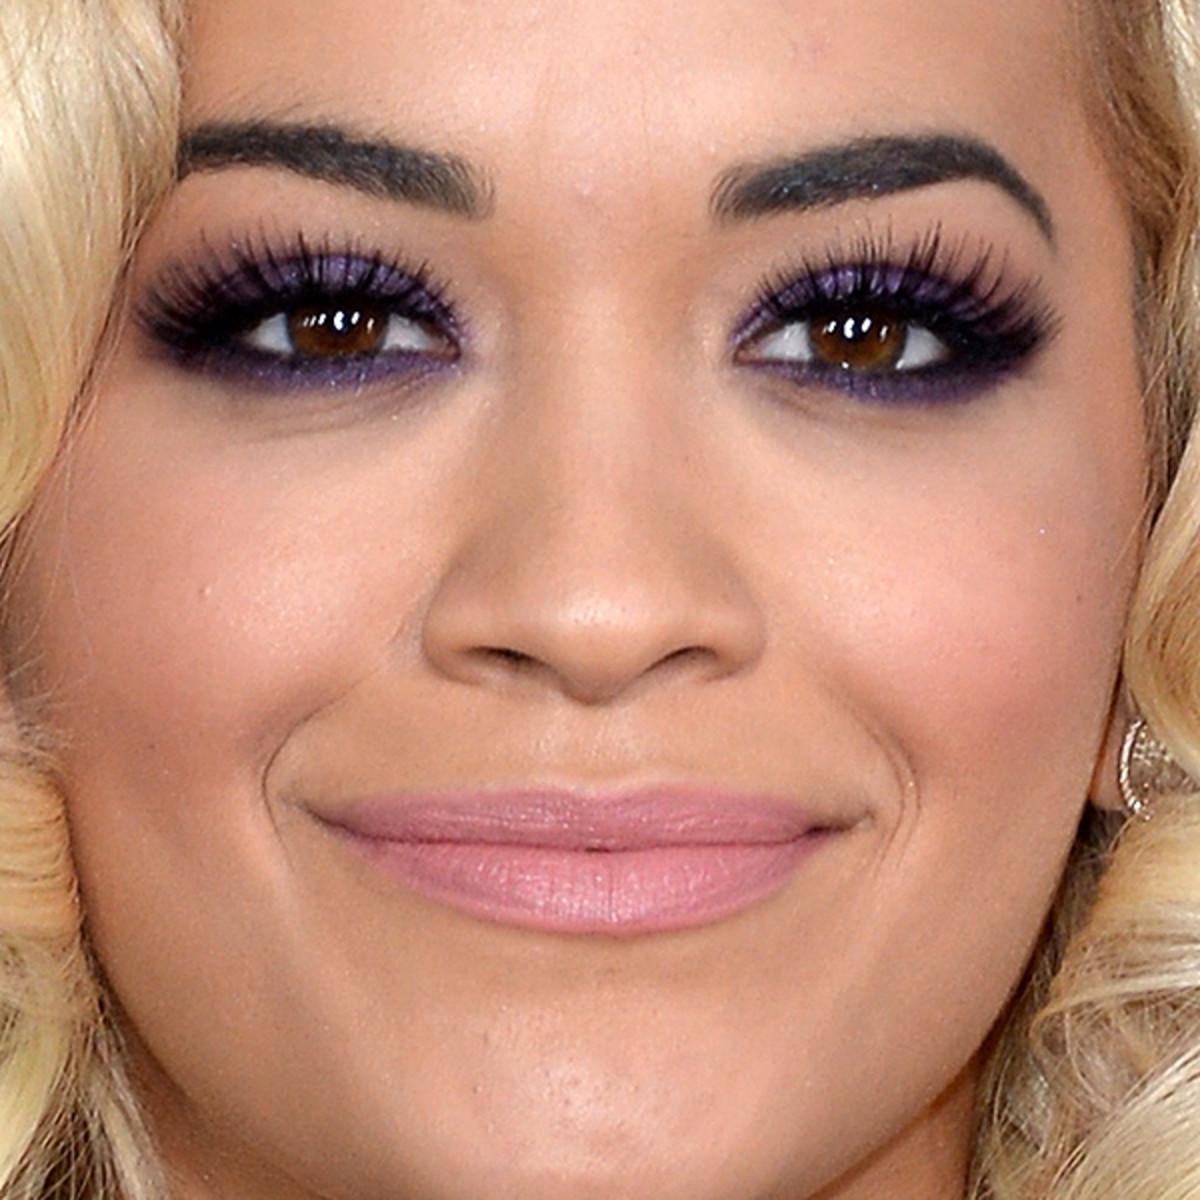 Rita Ora, Grammys 2014 makeup (2)